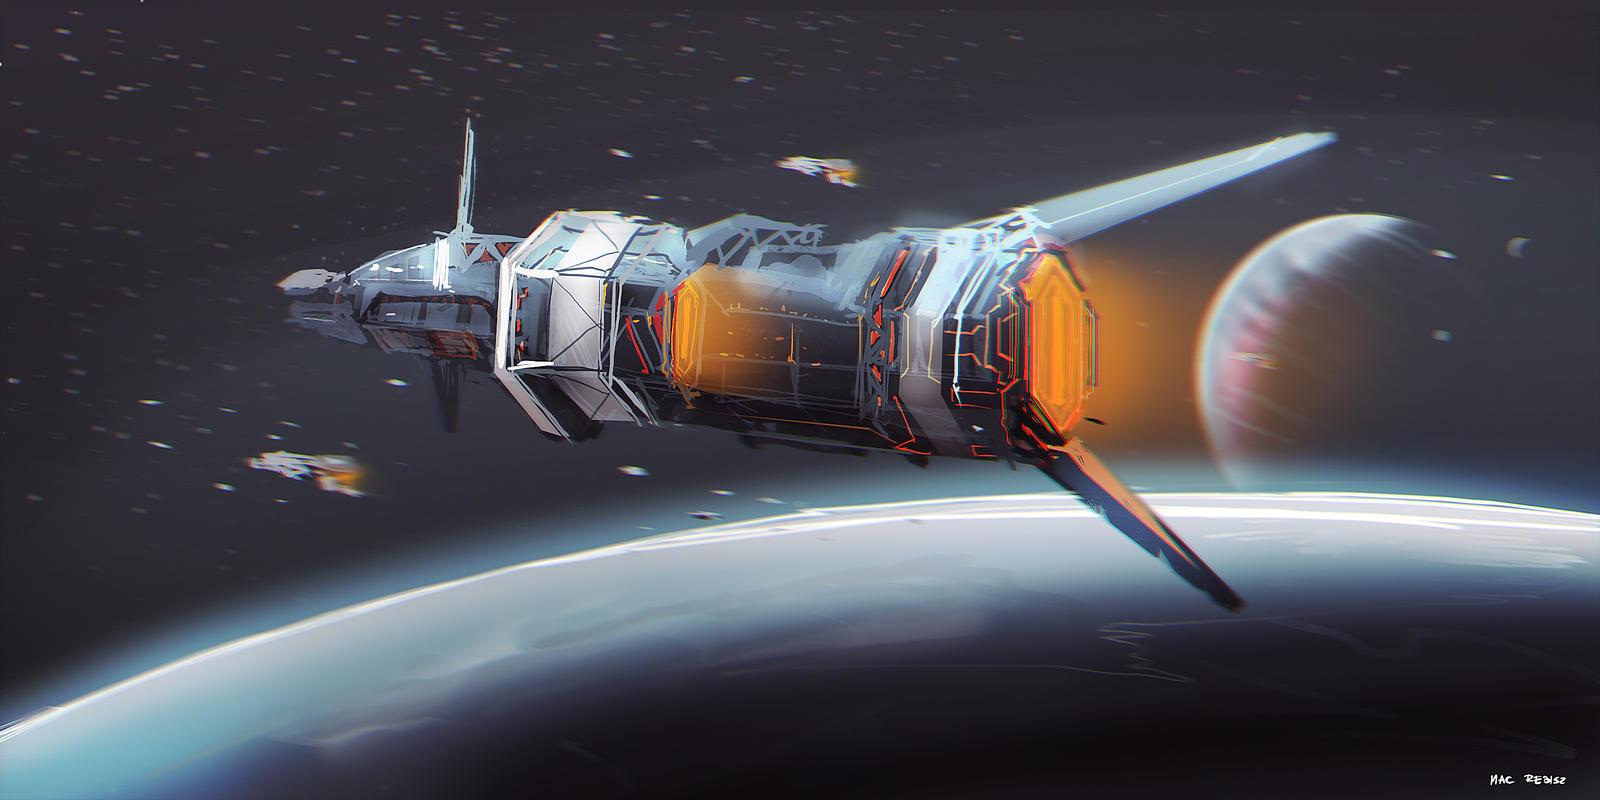 CoffeePainting: Space scene by MacRebisz